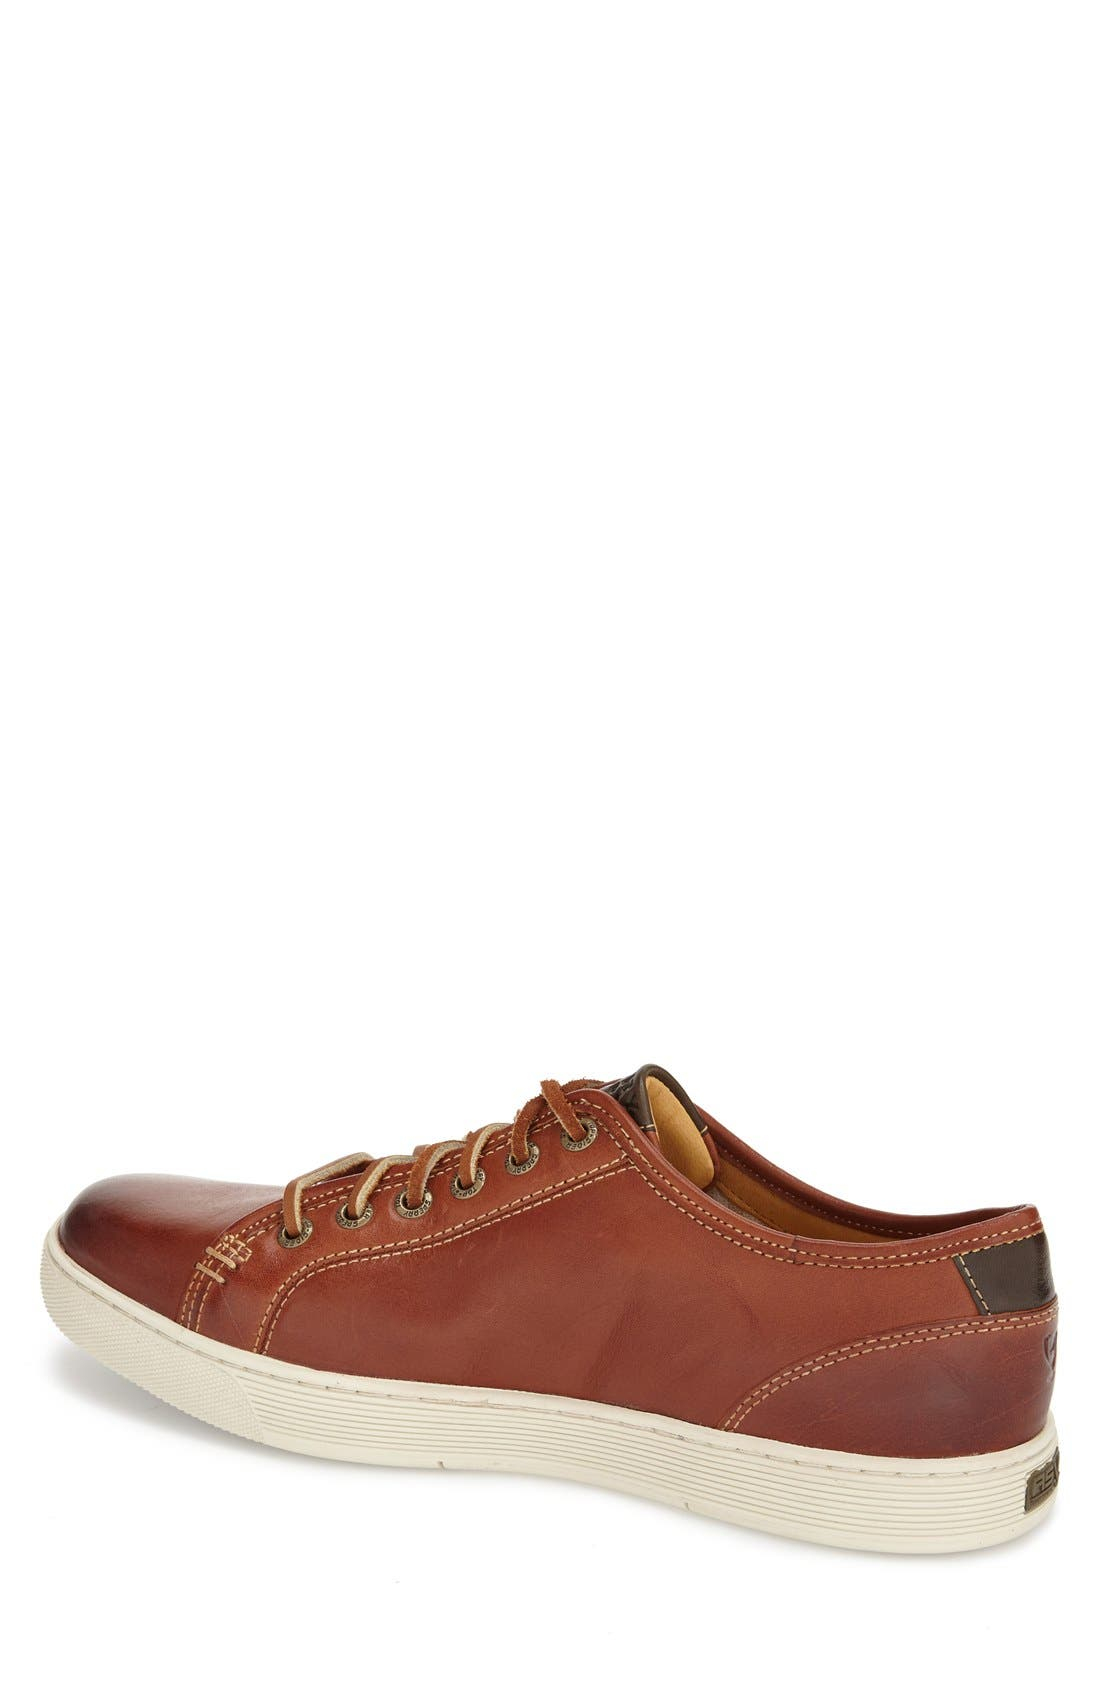 Alternate Image 2  - Sperry 'Gold Cup - LTT' Sneaker (Men)'